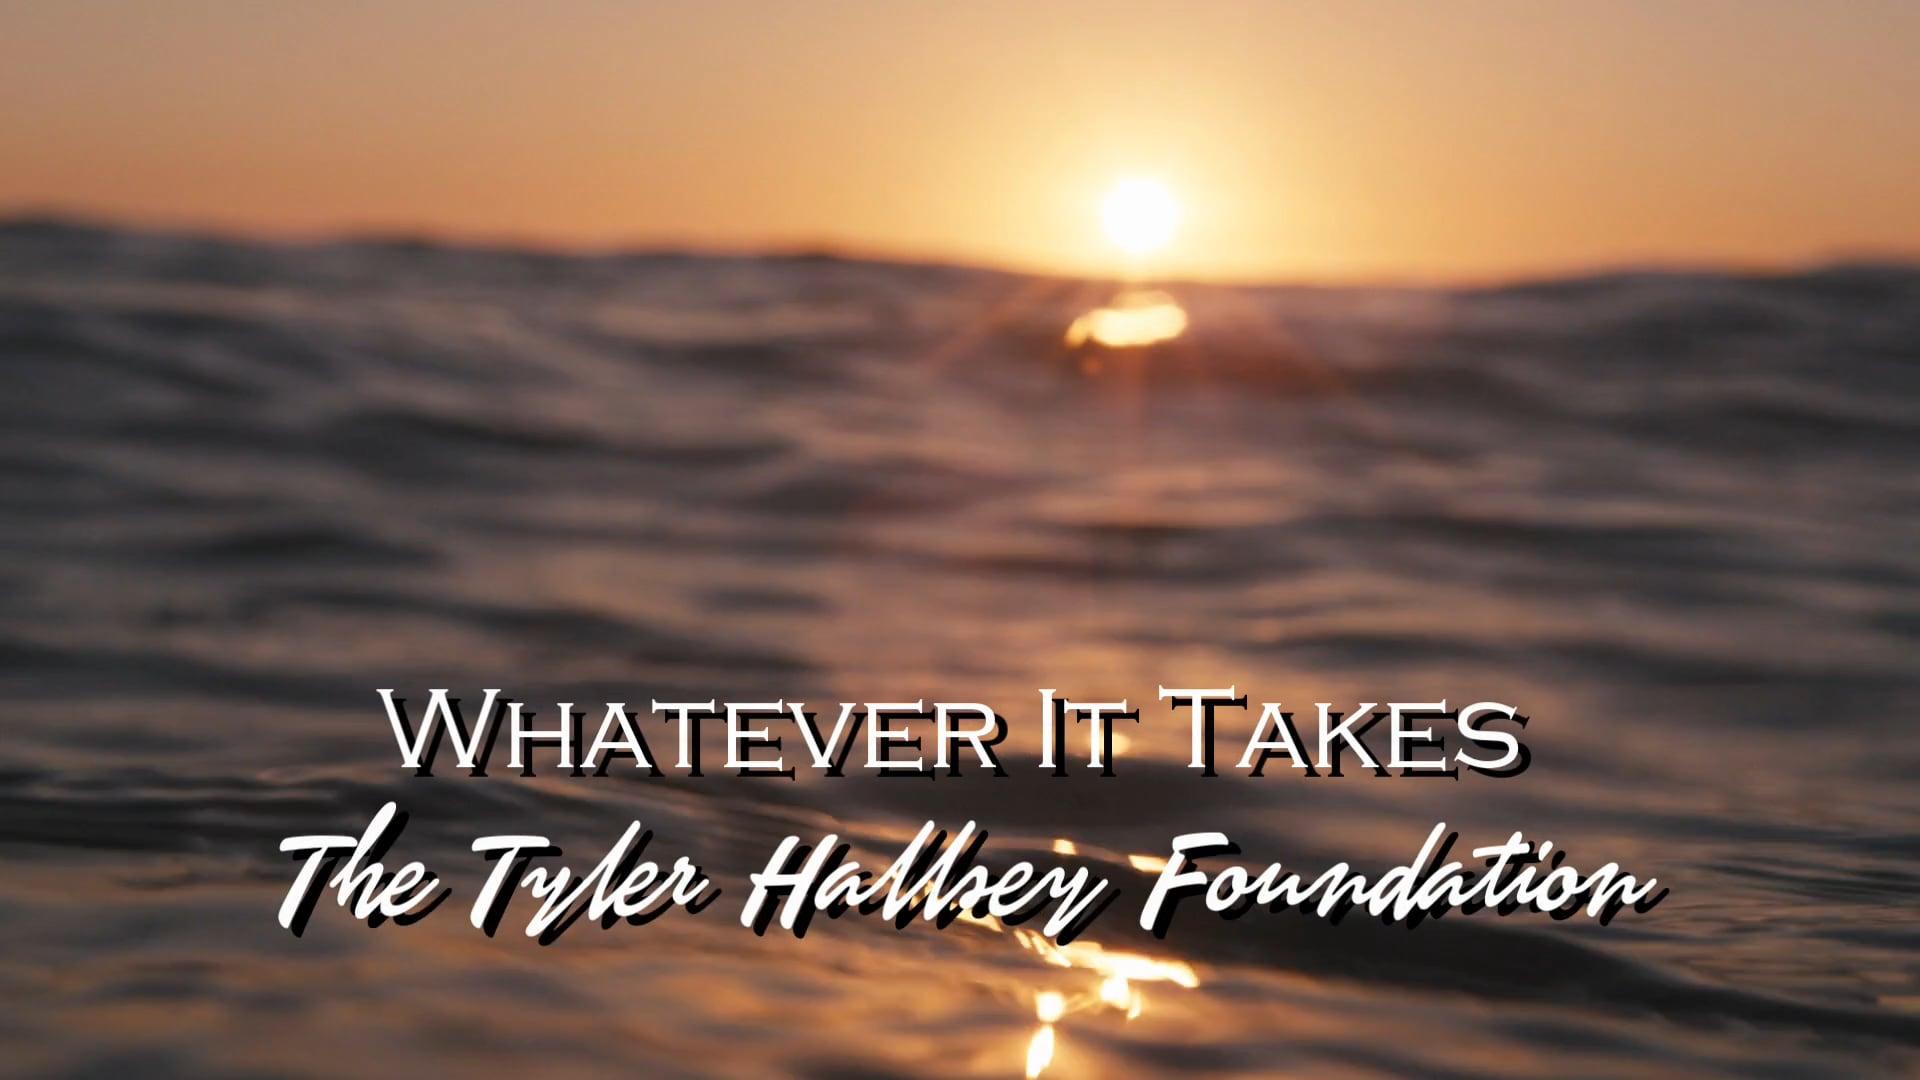 The Tyler Hallsey Foundation